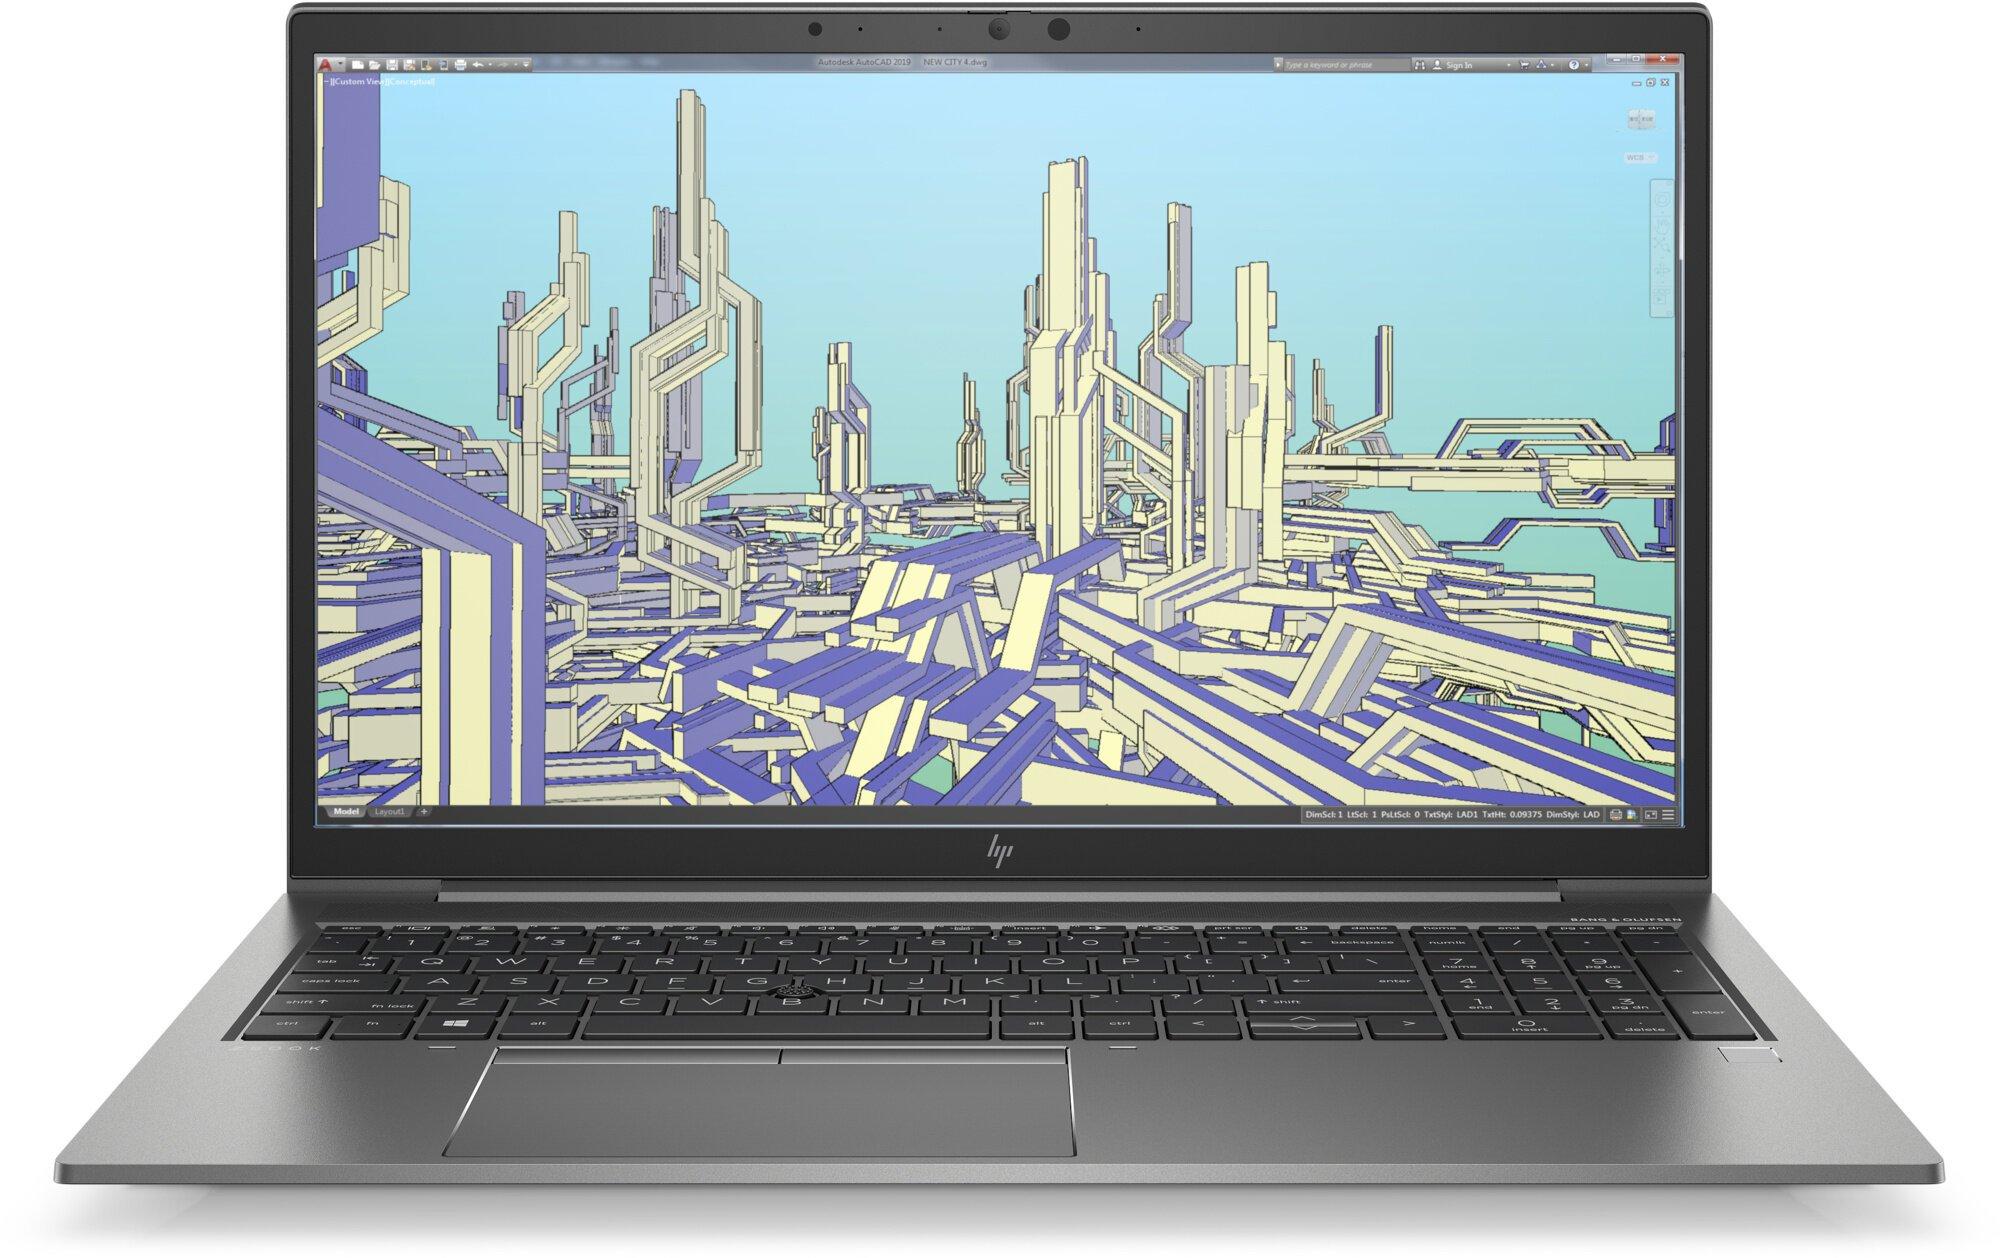 HP Zbook Firefly 15 G8 15,6'' UHD 400nts i7-1185G7/32GB/1TB/Nvidia Quadro T500-4GB/vPRO/W10P - 313P1EA#BCM